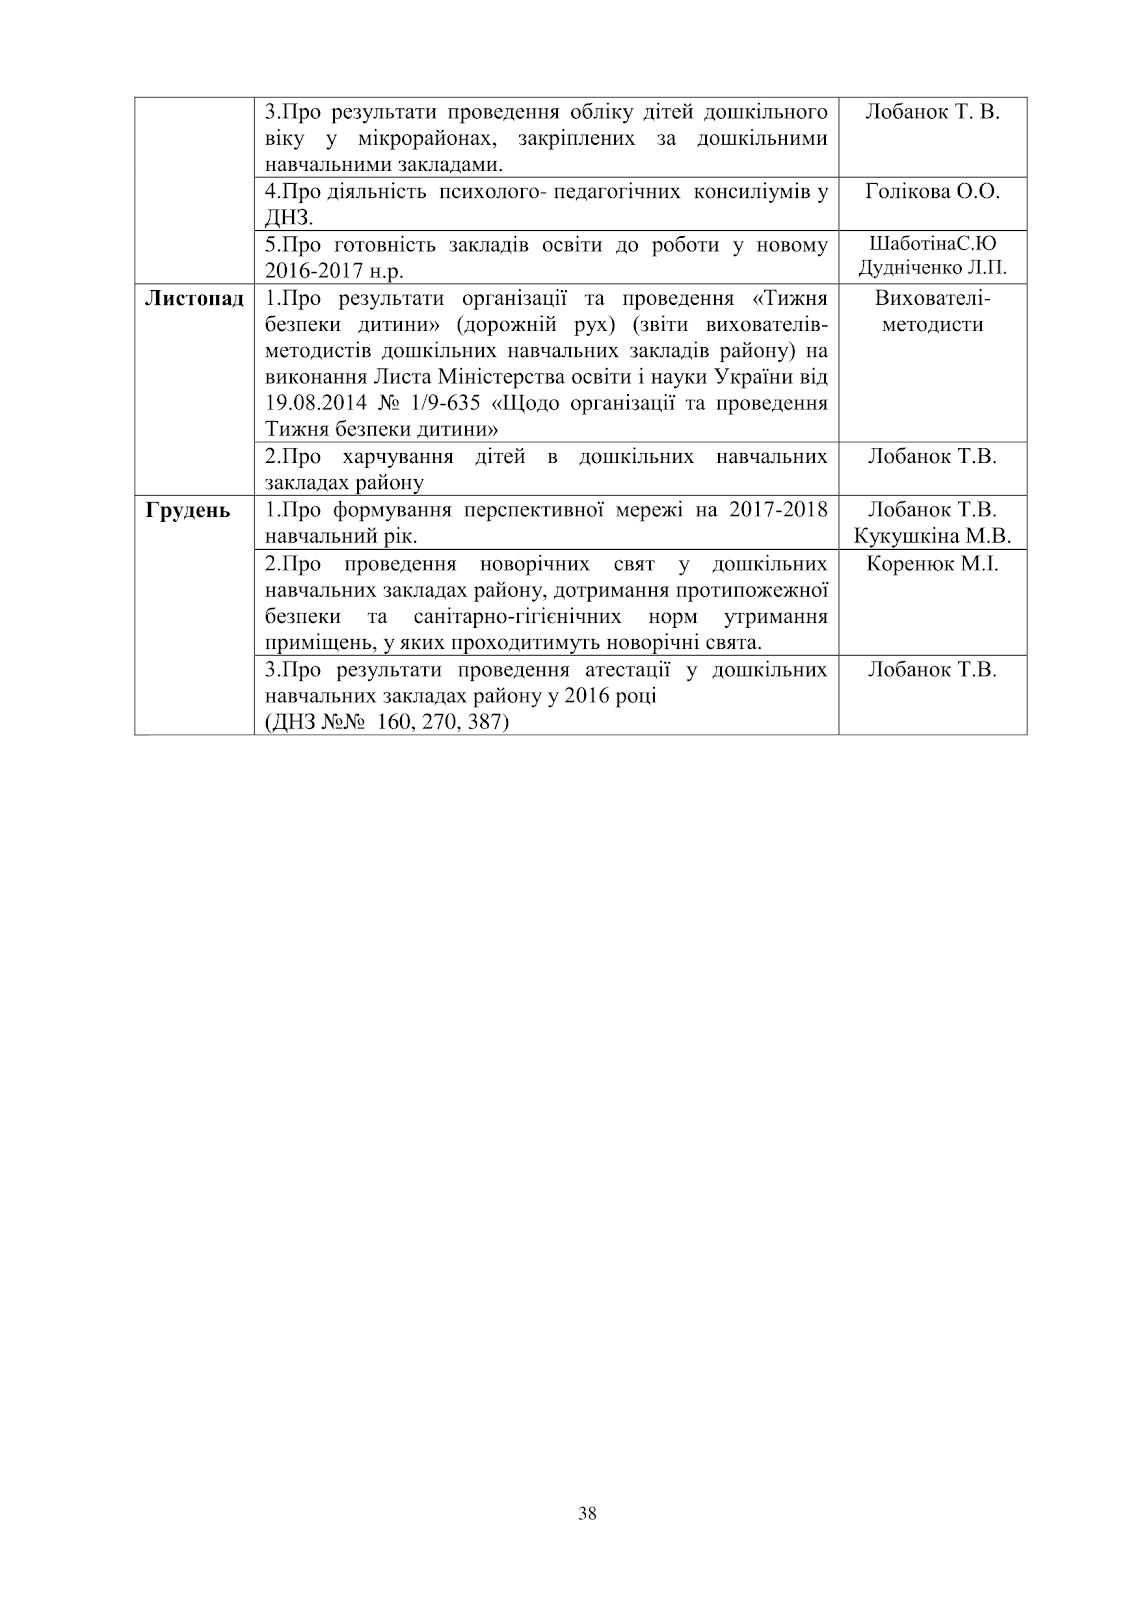 C:\Users\Валерия\Desktop\план 2016 рік\план 2016 рік-038.png